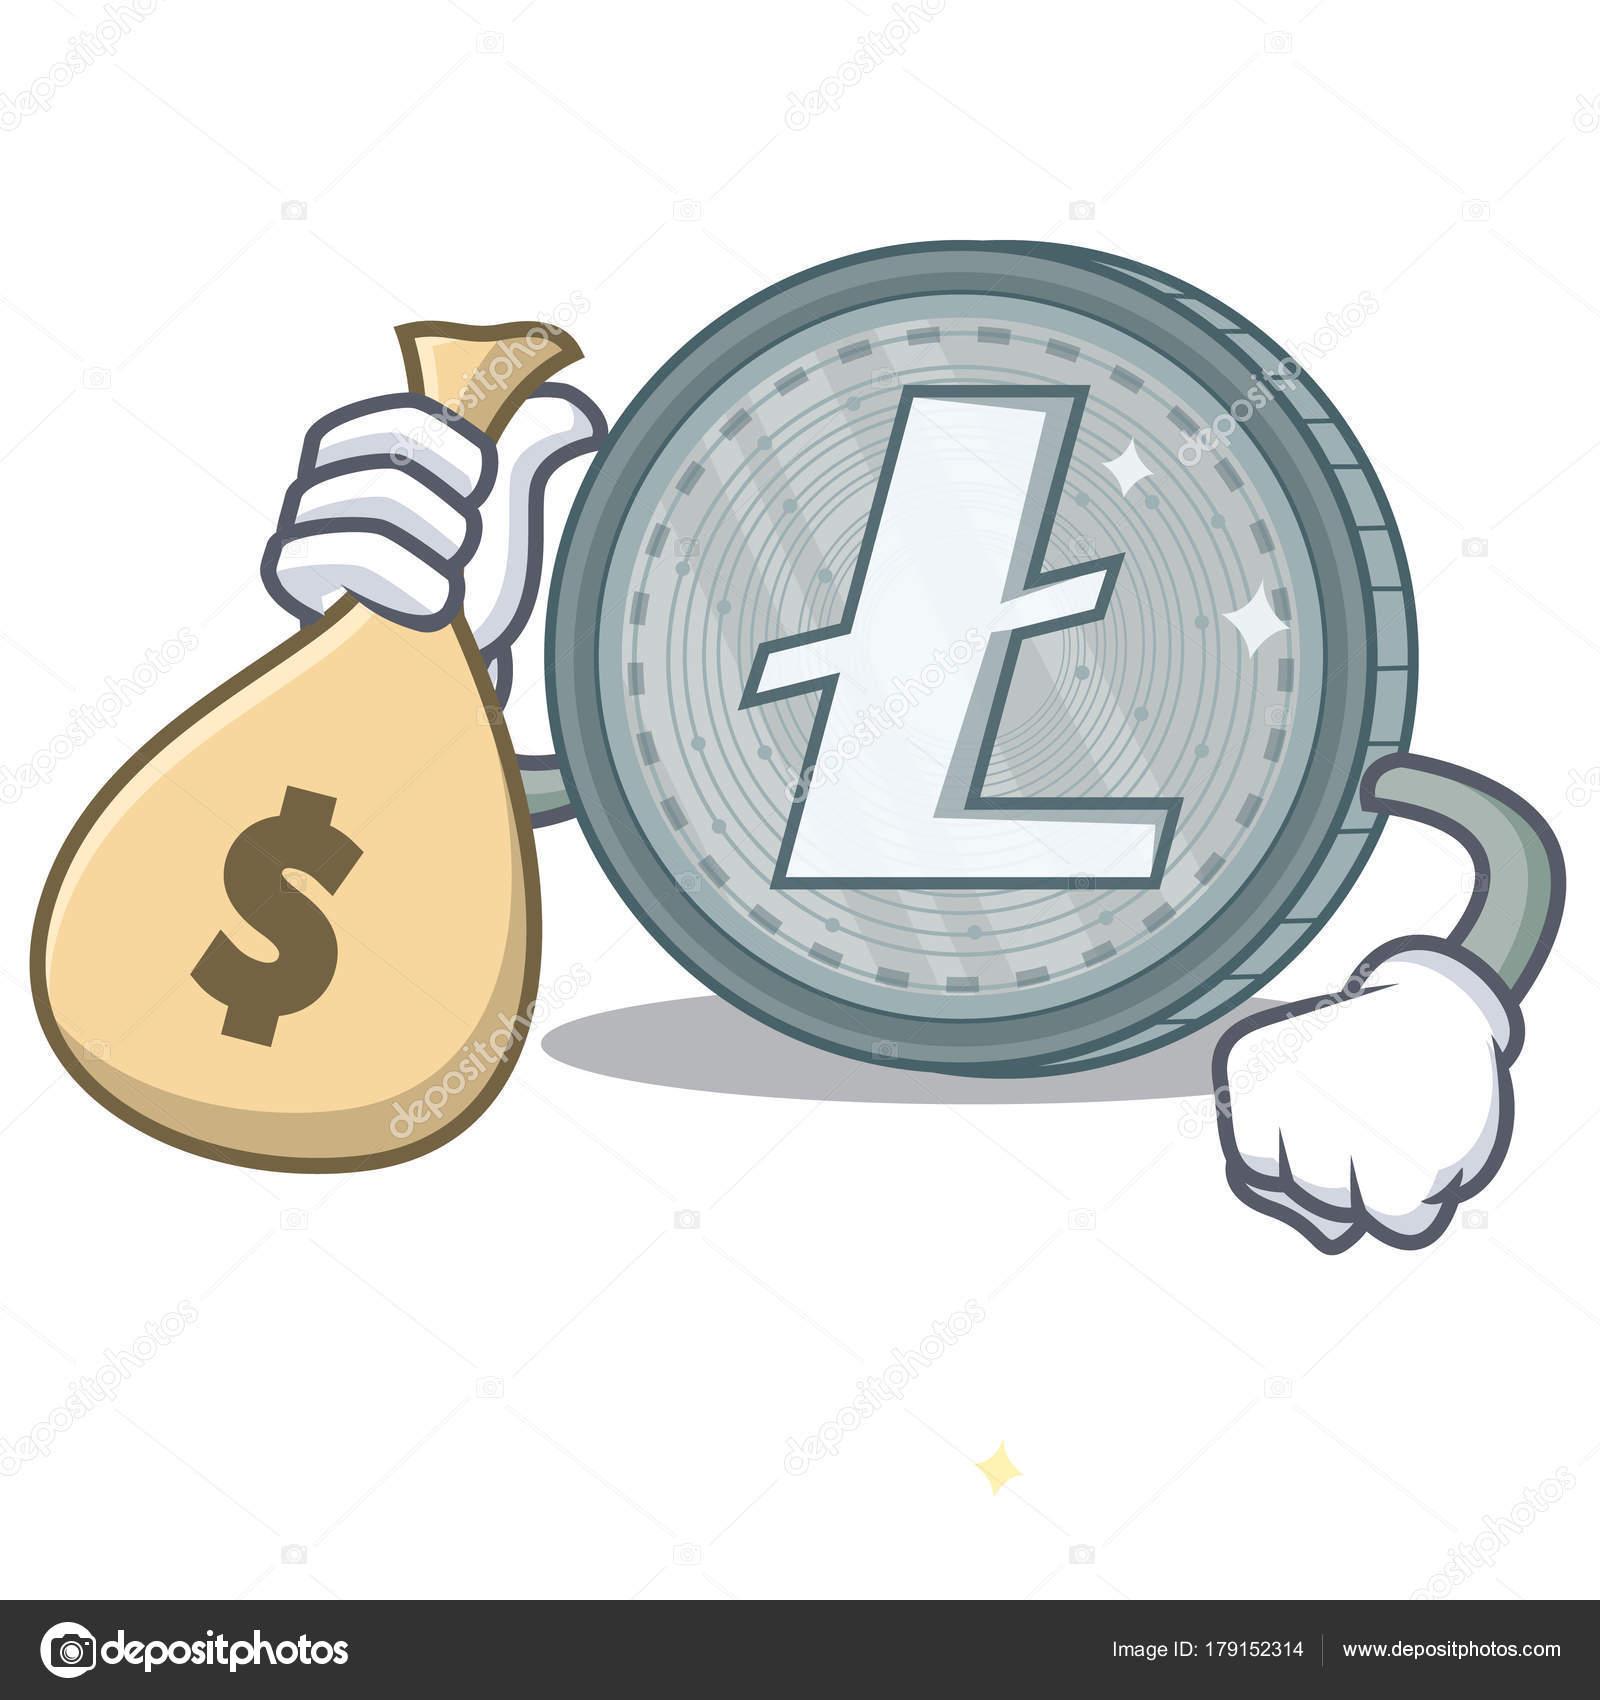 Dinero Animados Litecoin Con Carácter Dibujos De Estilo Bolsa wOkXPiZulT